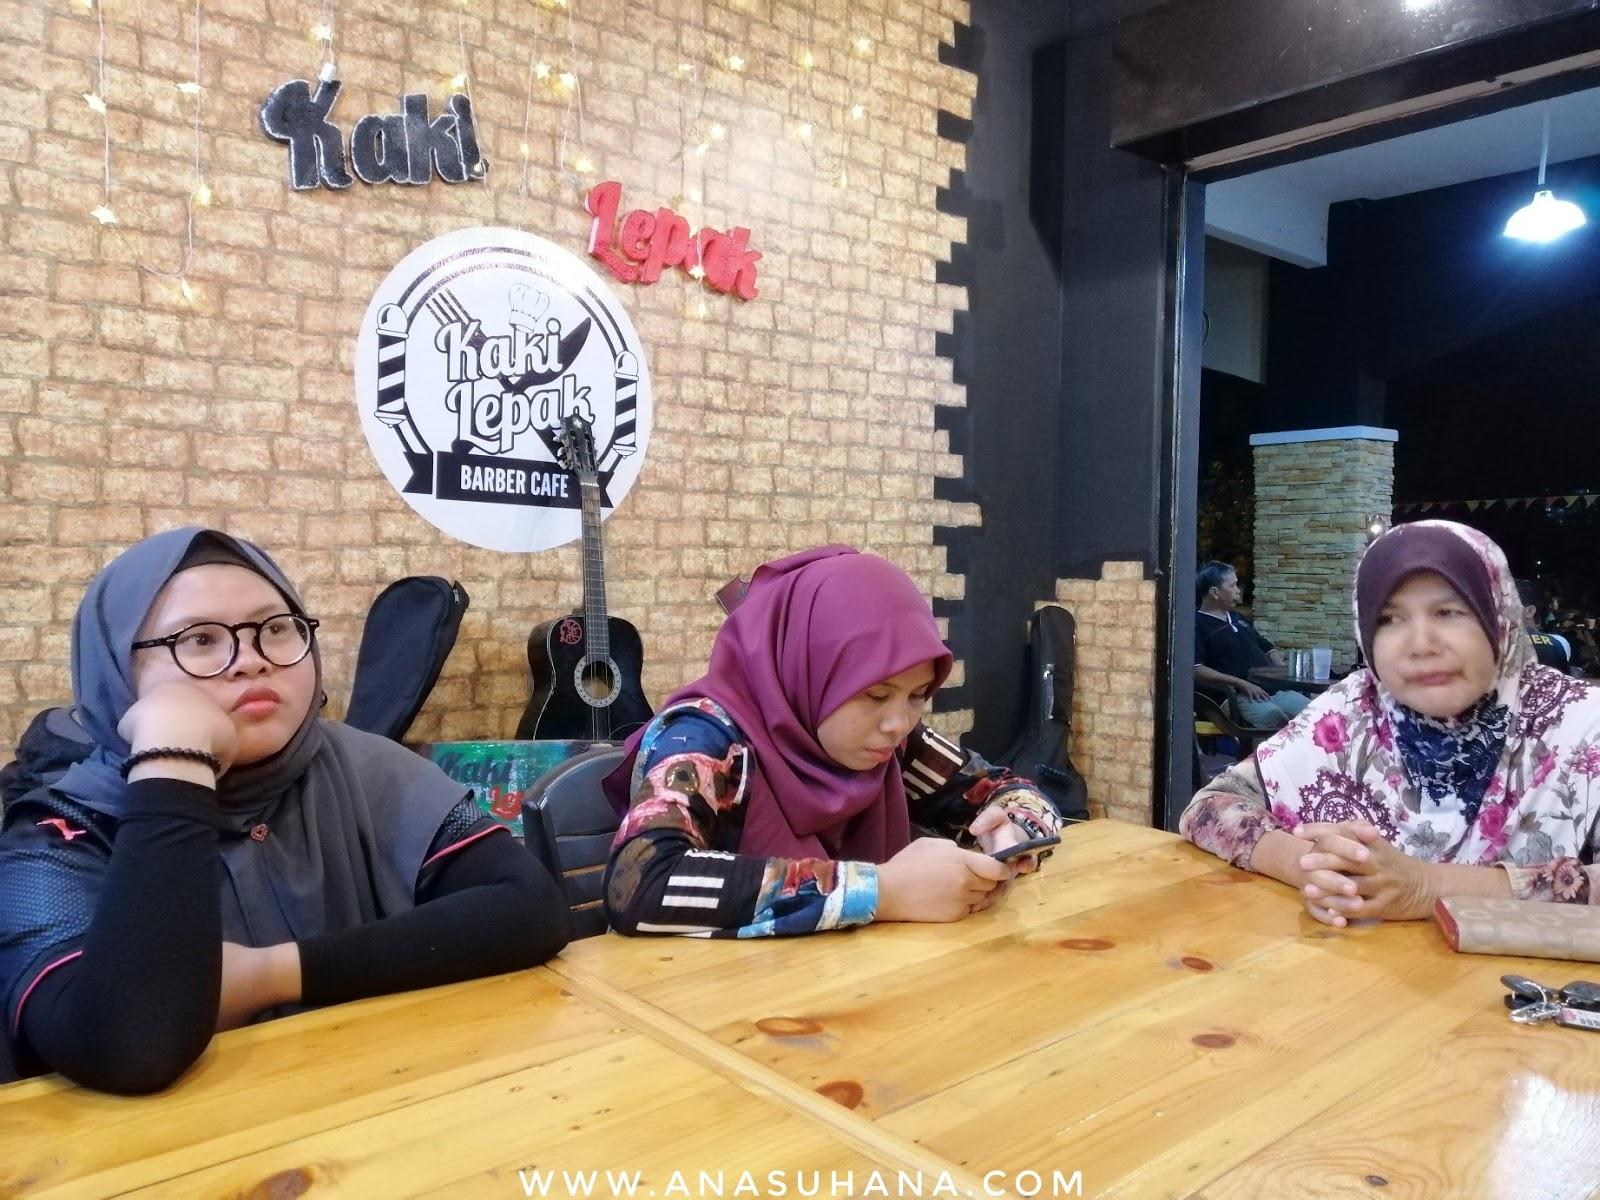 Kaki Lepak Barber Cafe